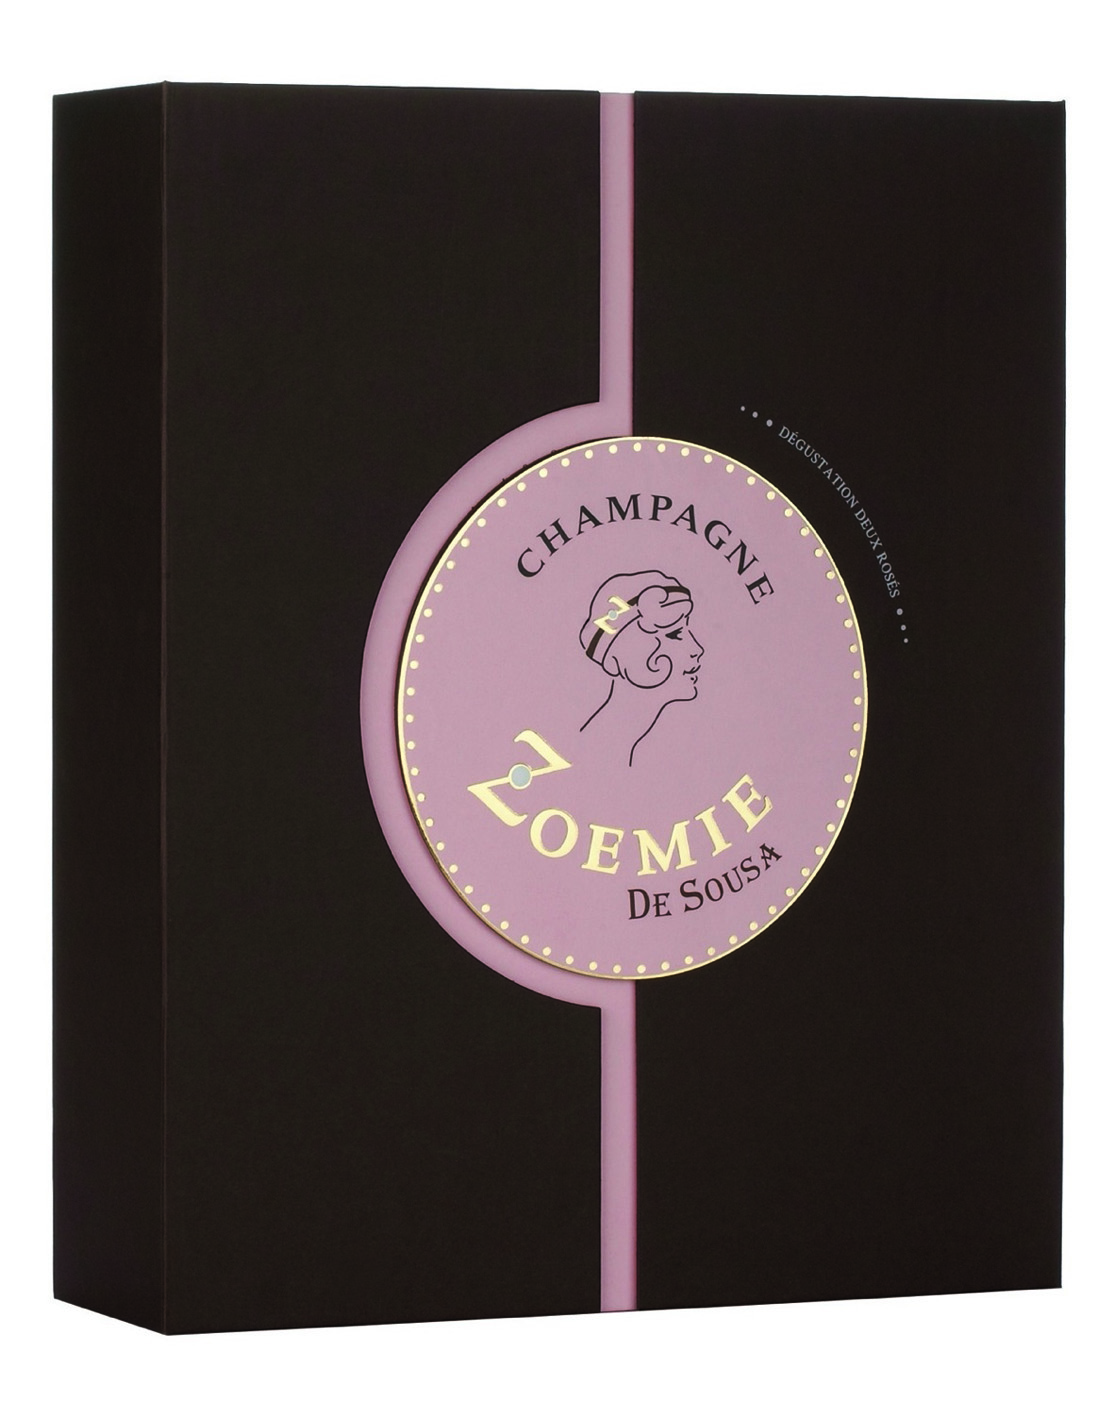 Coffret Champagne Zoemie de Sousa 2